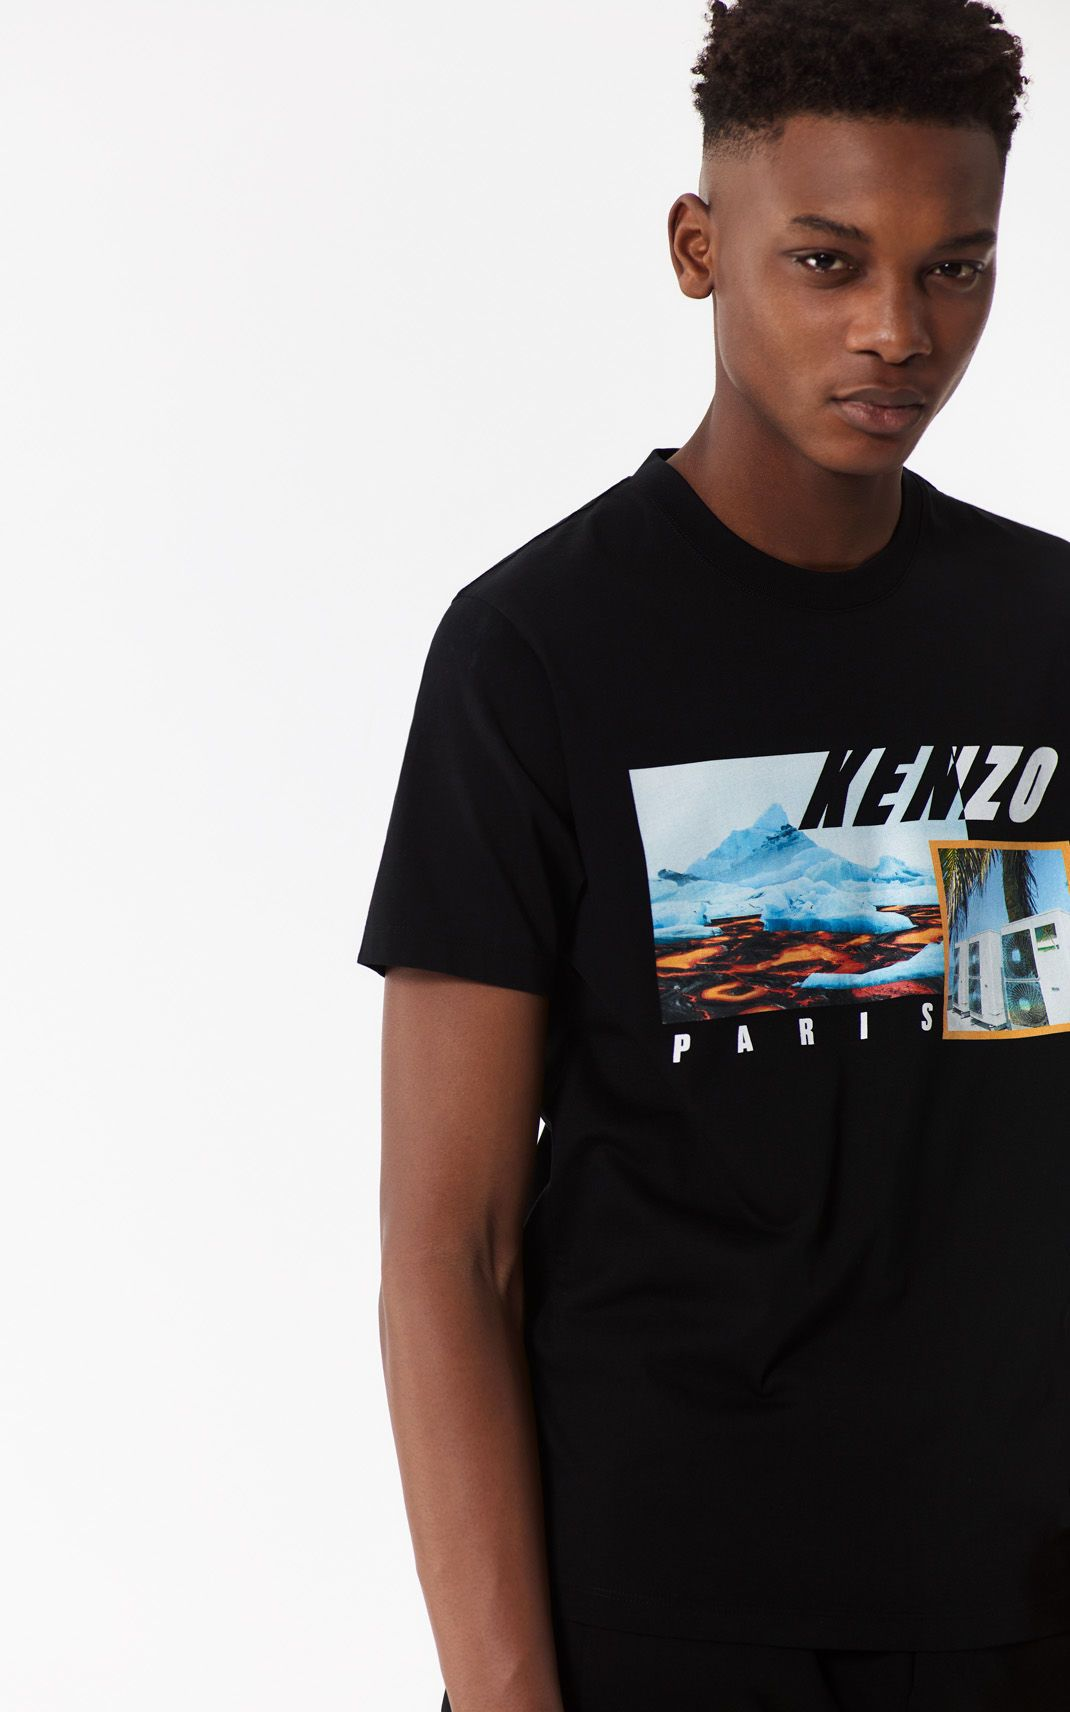 T-shirt  KENZO Landscape  NOIR homme   t shirt   Pinterest 437277d44cb